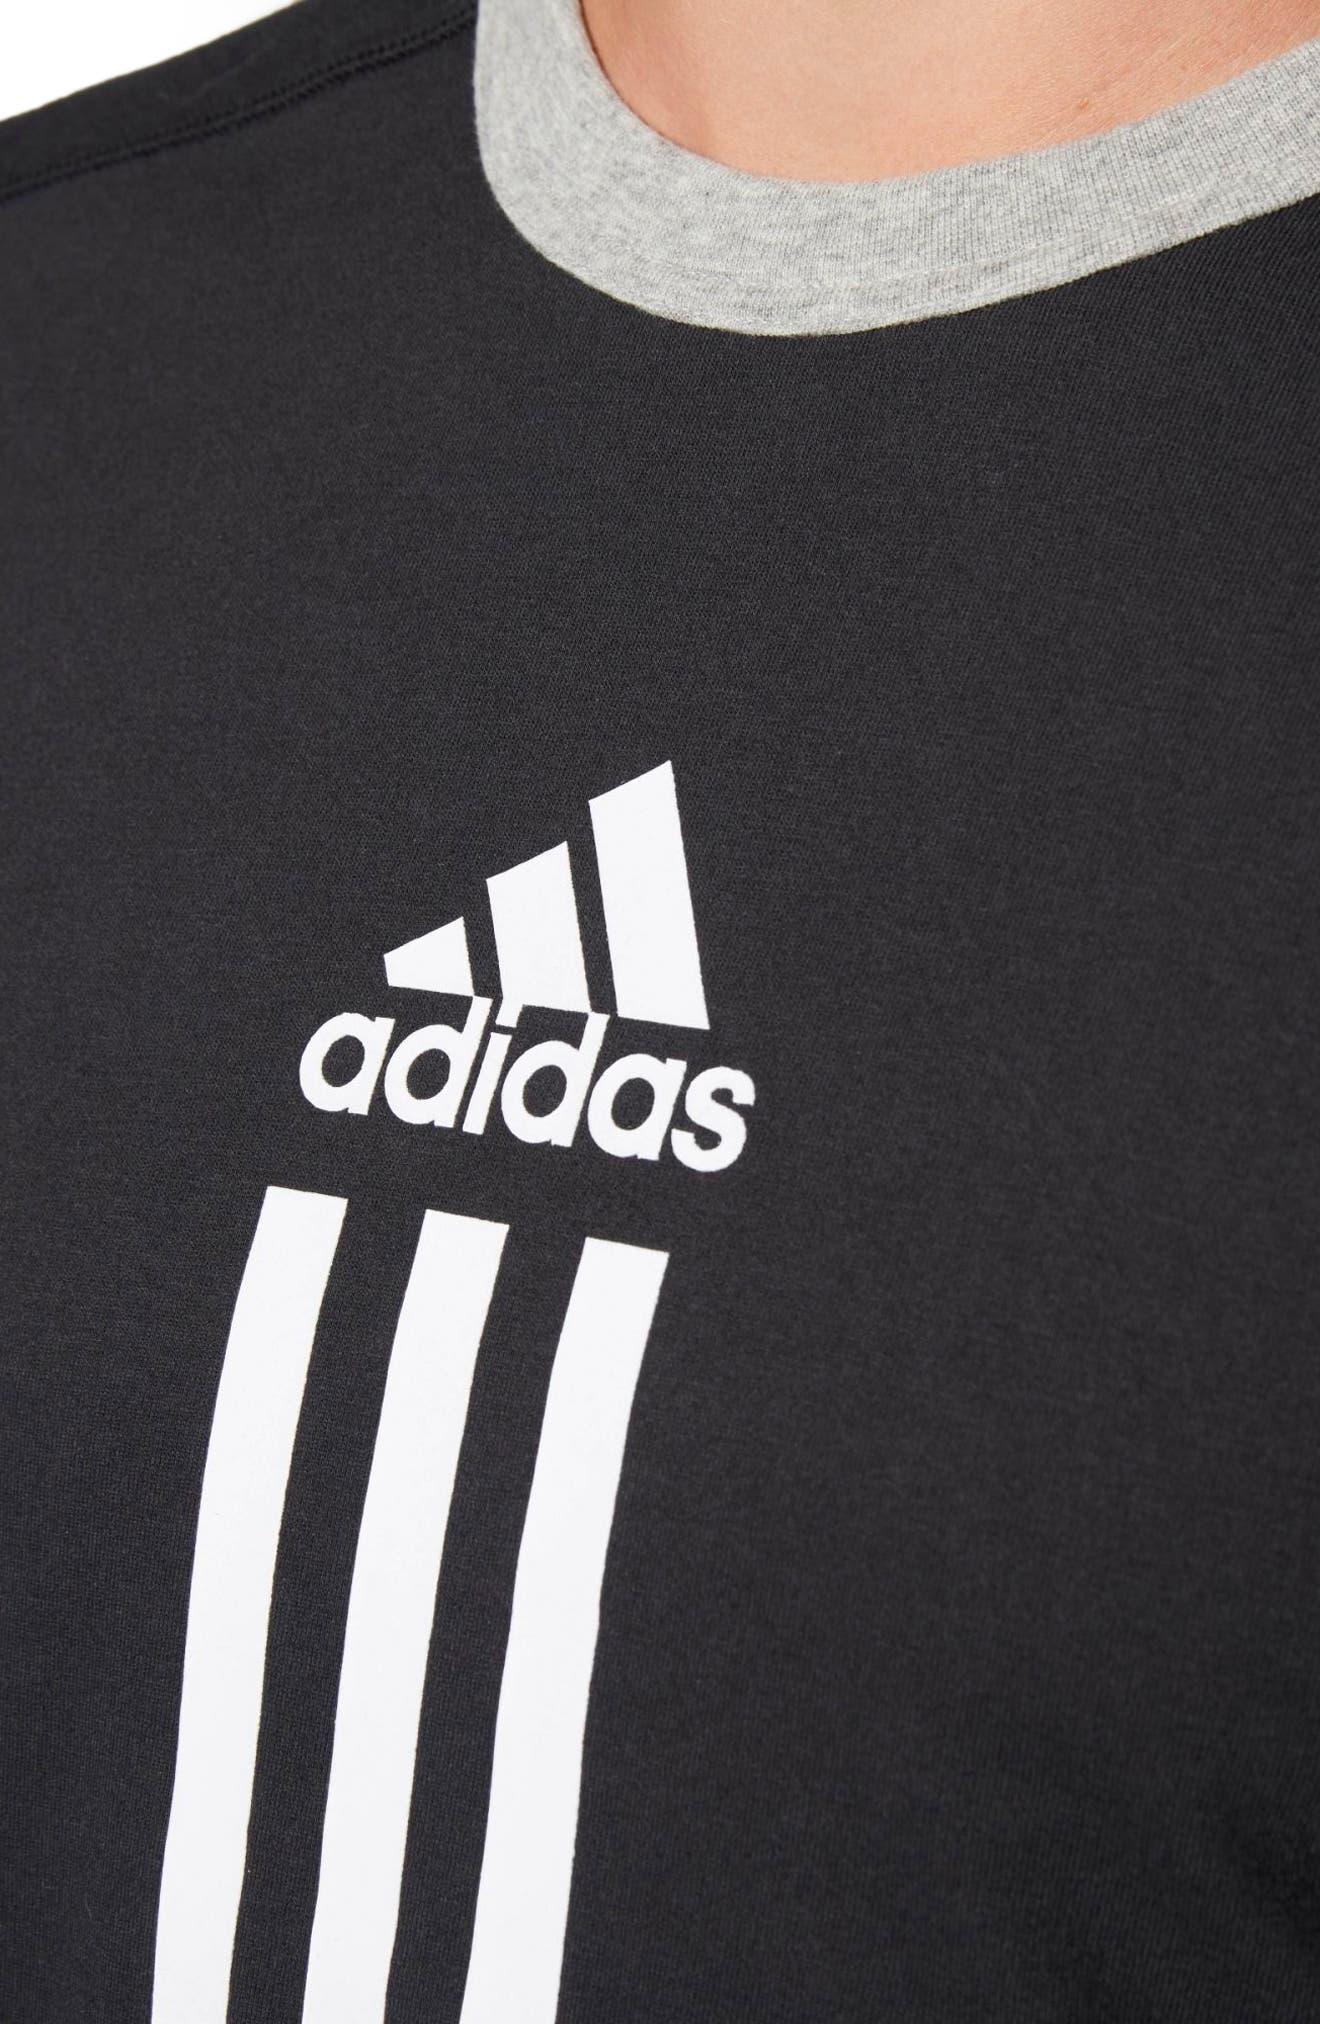 ID Long Sleeve Performance T-Shirt,                             Alternate thumbnail 3, color,                             Black/ Medium Grey Heather